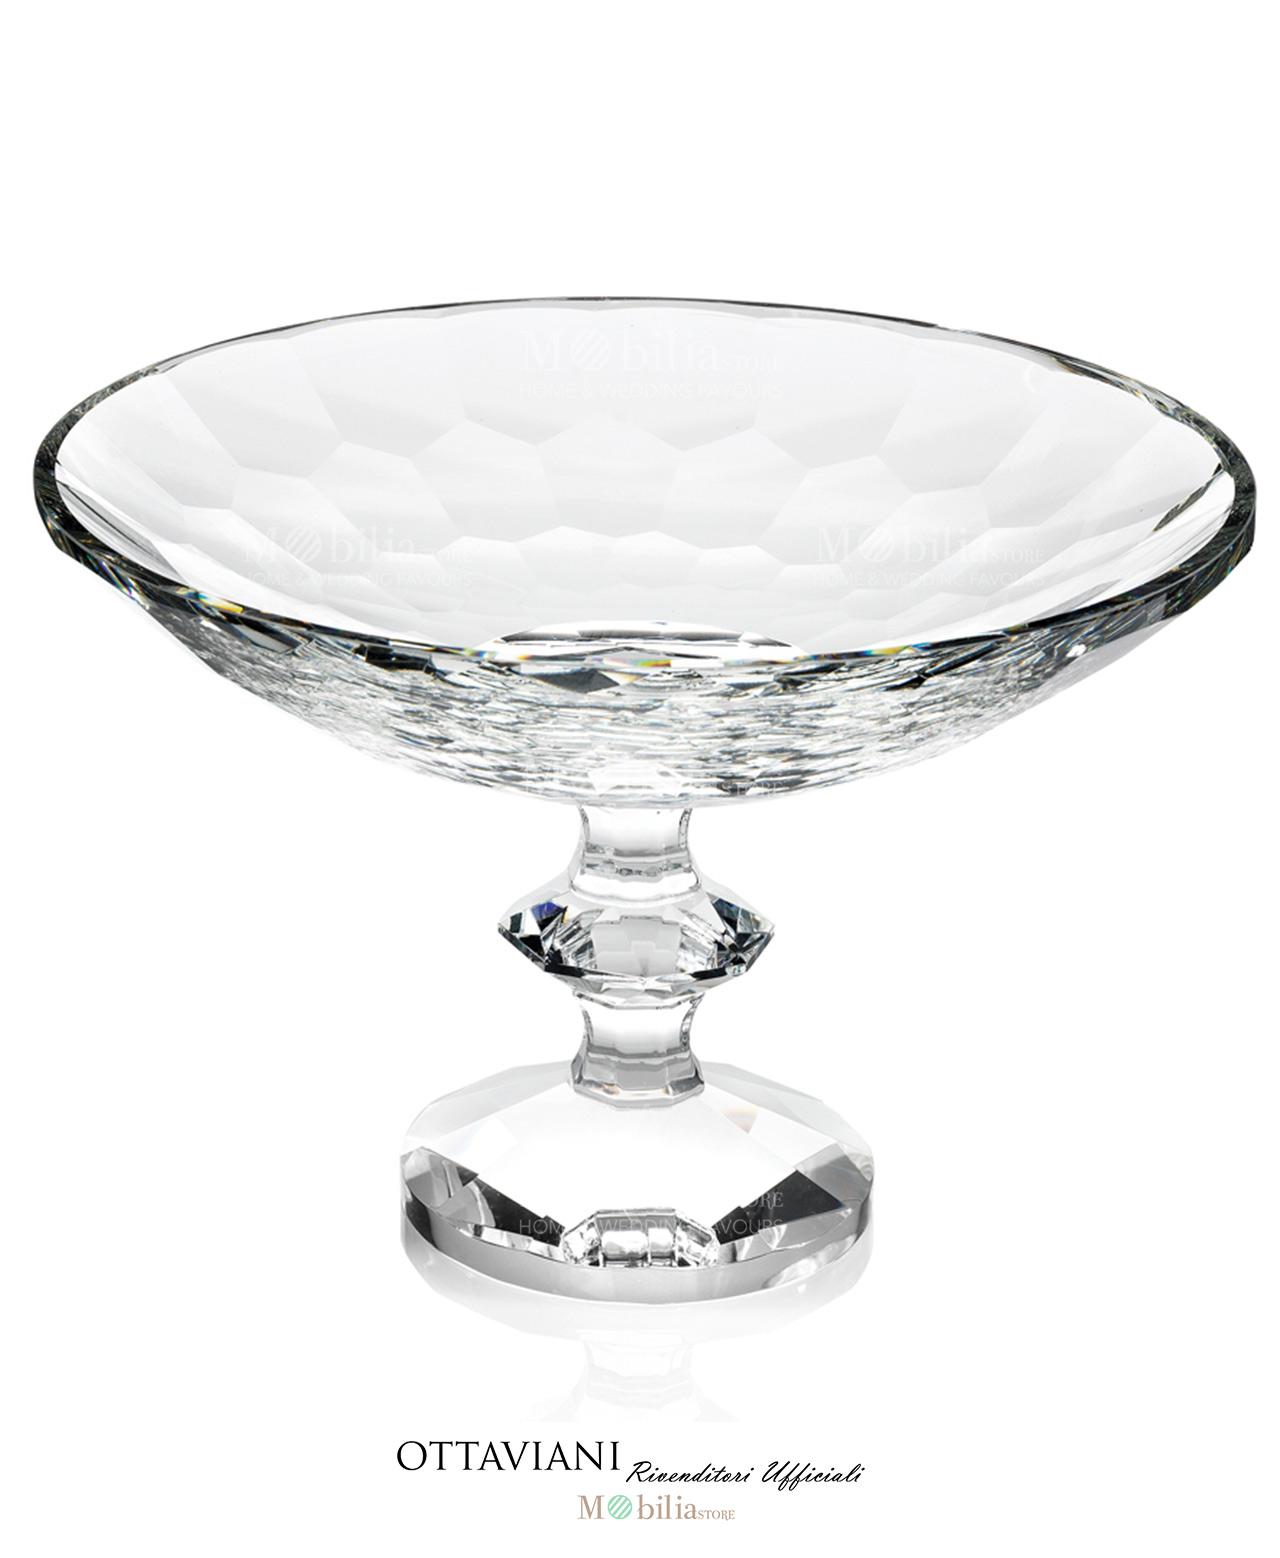 Alzata cristallo Ottaviani - Mobilia Store Home & Favours